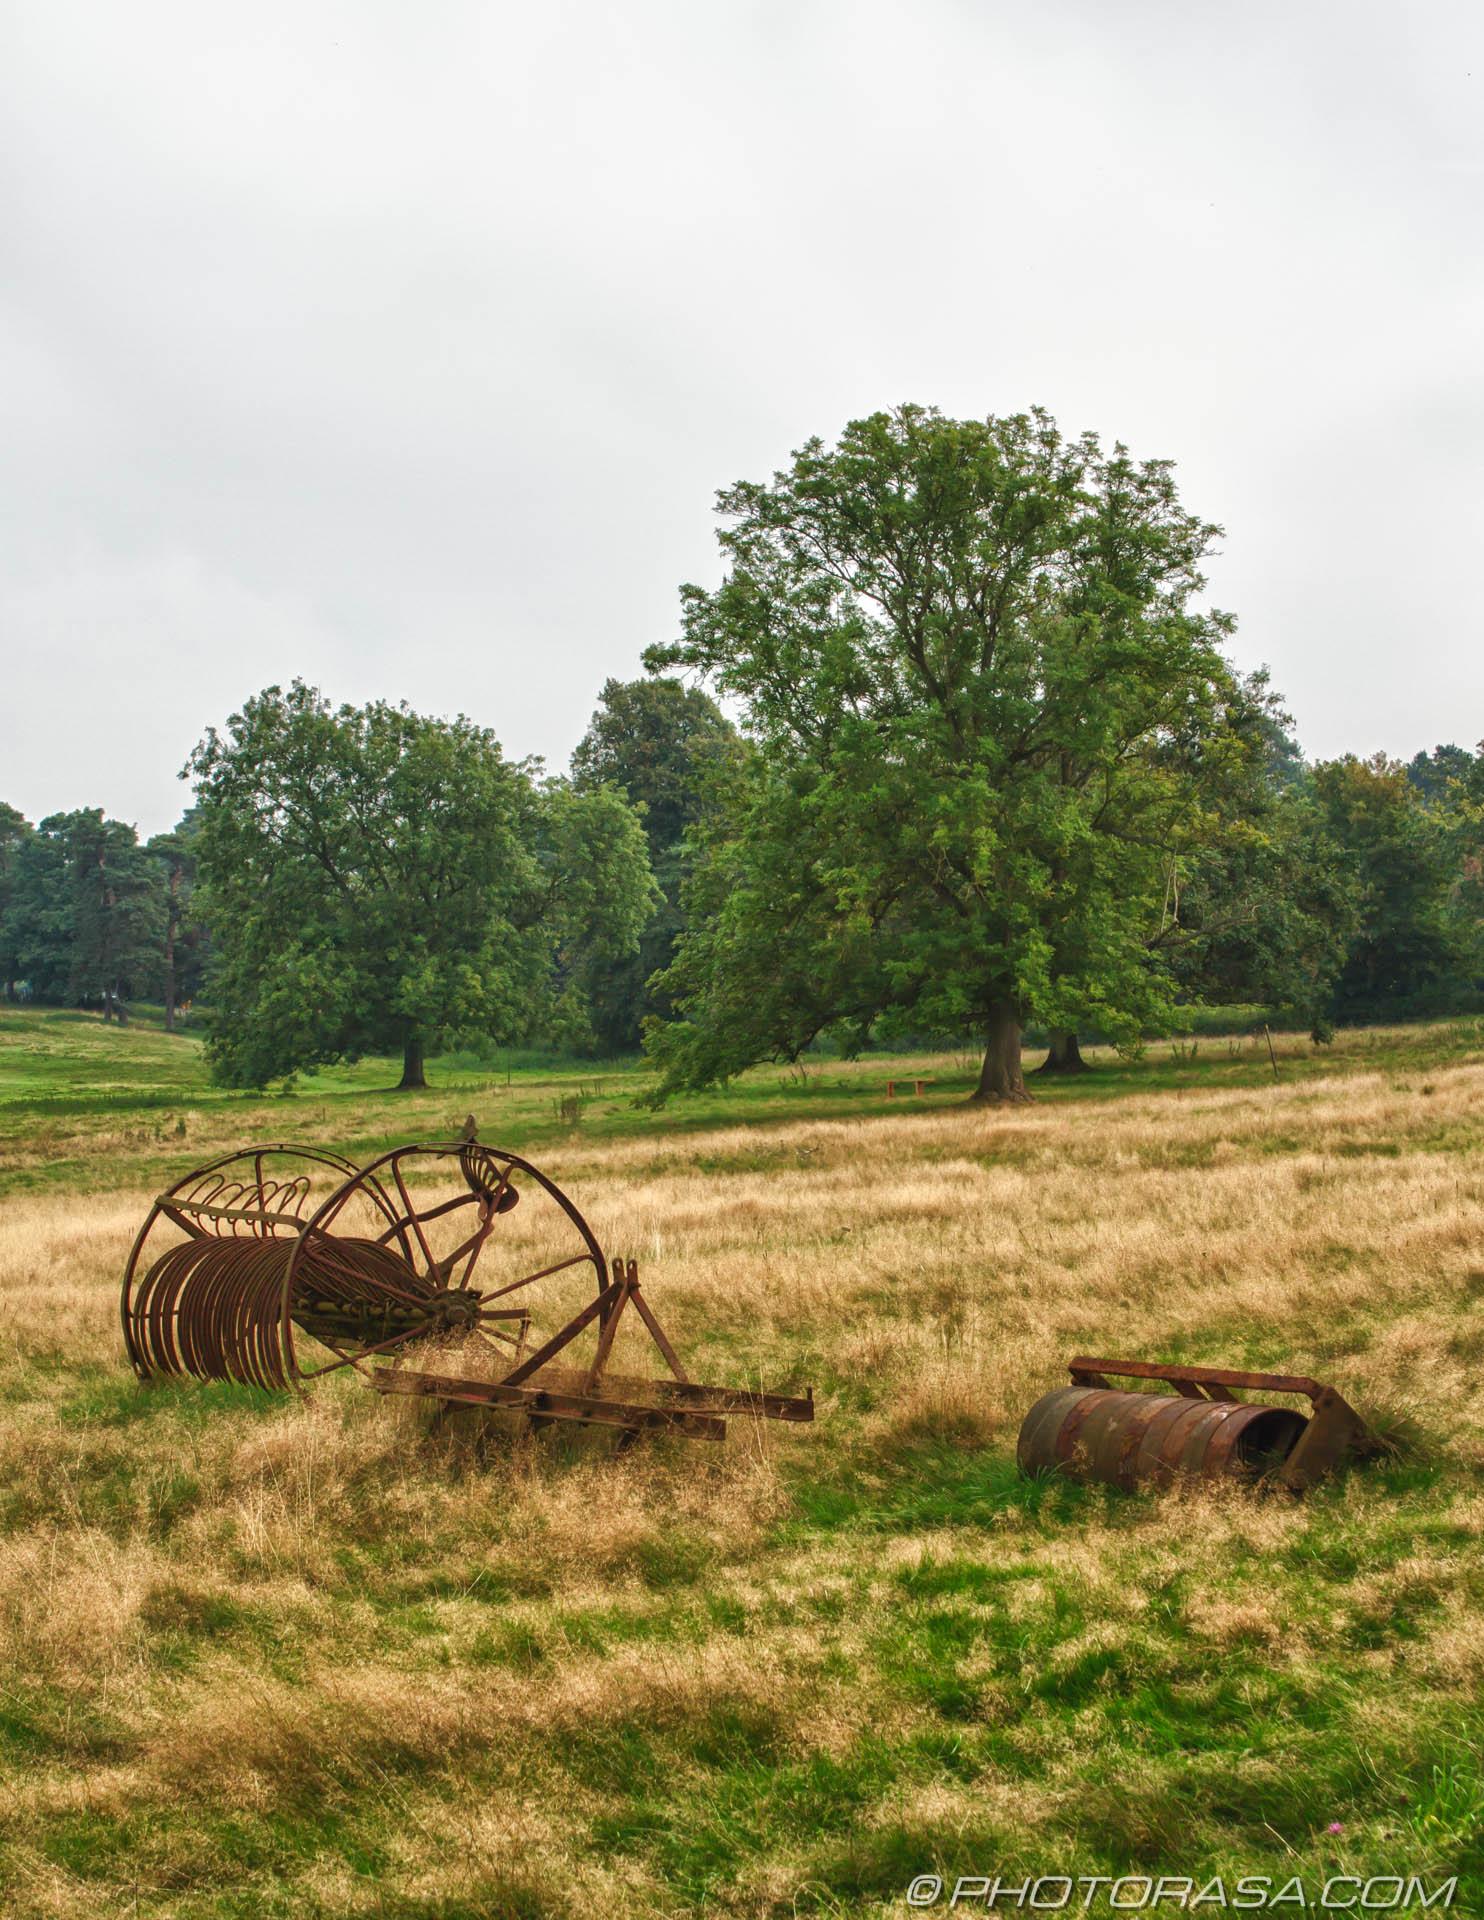 https://photorasa.com/farming/rusting-farm-machinery-in-field/